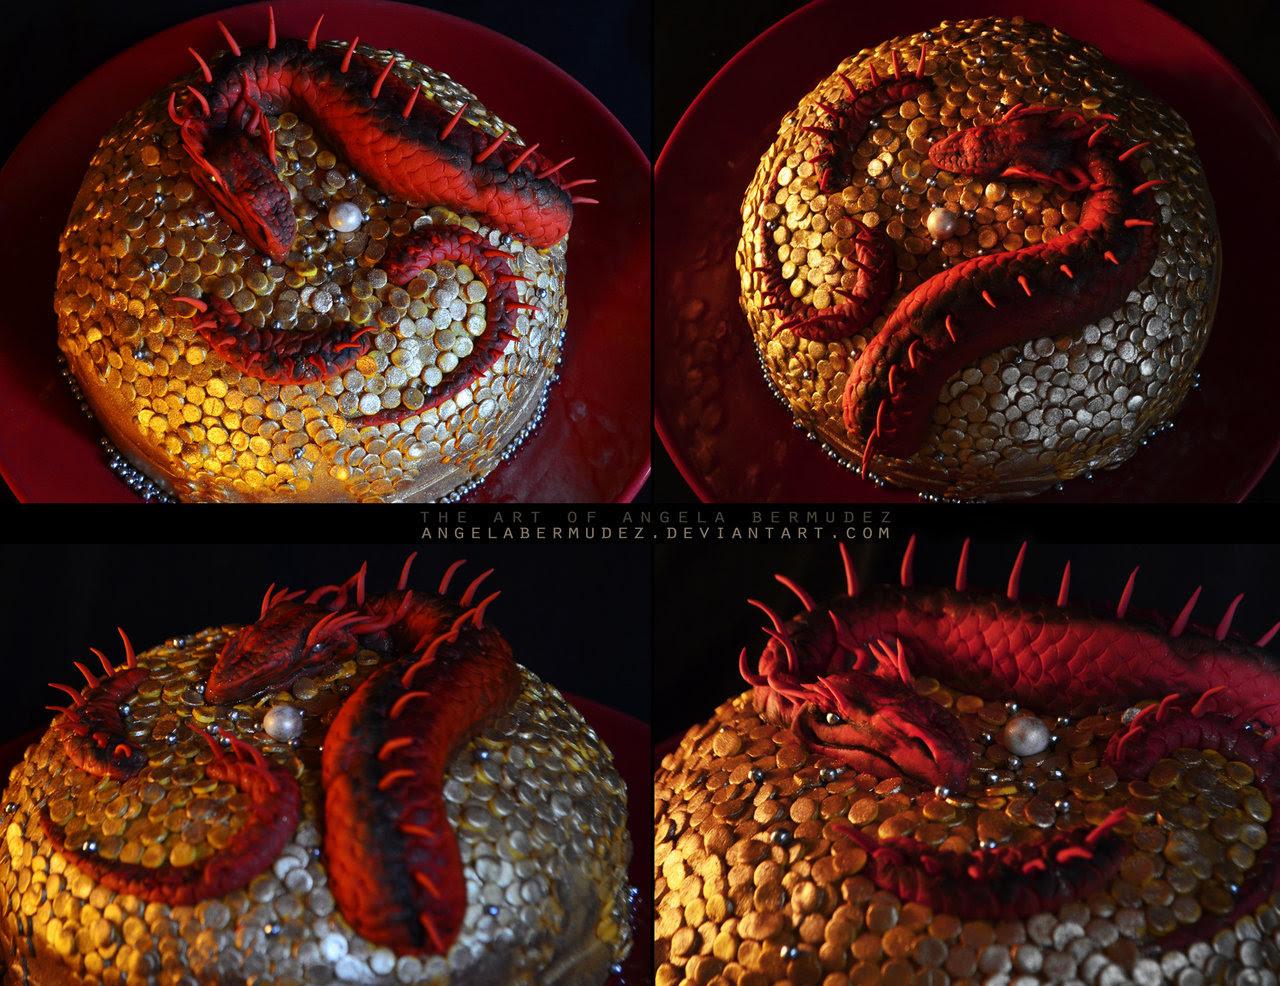 Smaug cake by Angela Bermudez